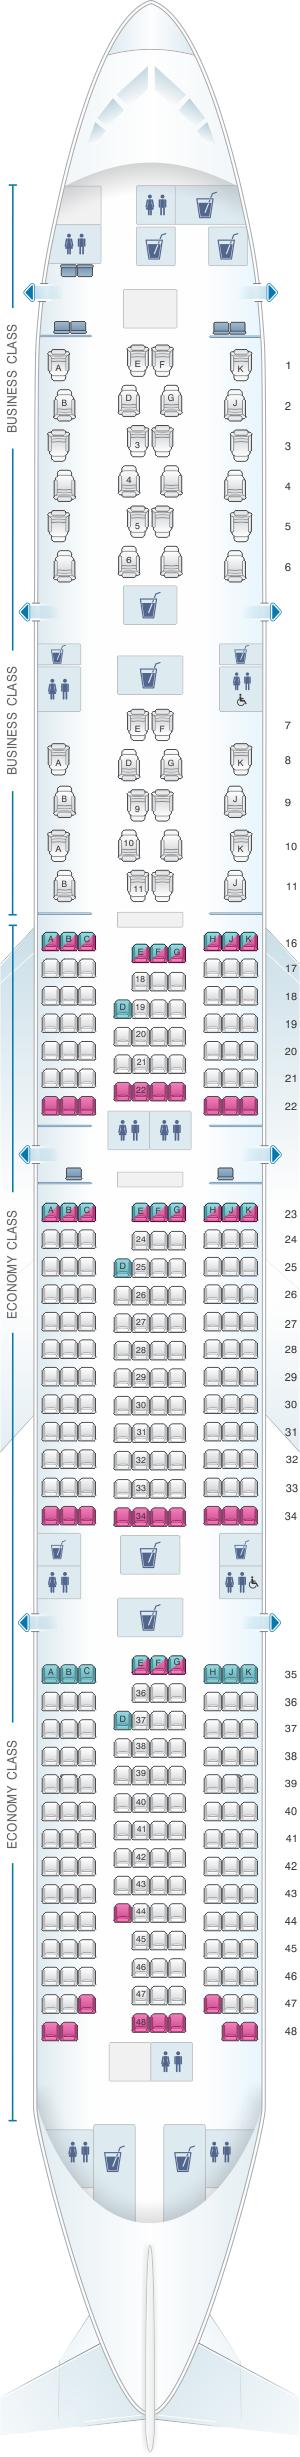 Seat map for Qatar Airways Boeing B777 300ER Qsuite